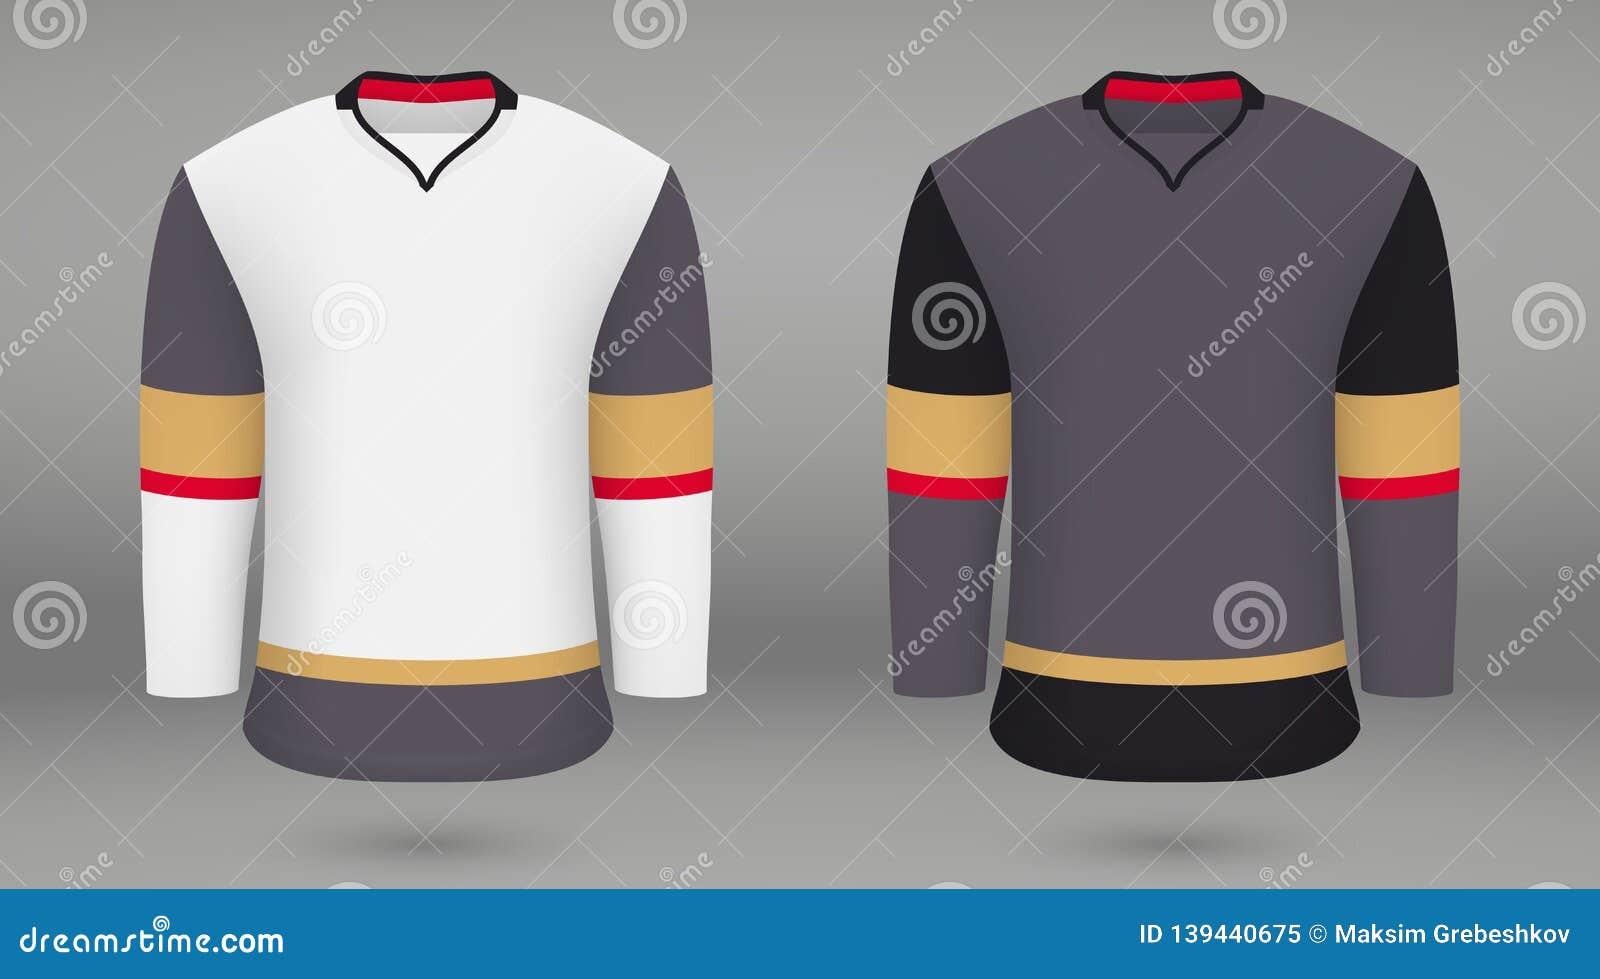 size 40 703a1 01fcb Shirt Template Forice Hockey Jersey Stock Illustration ...